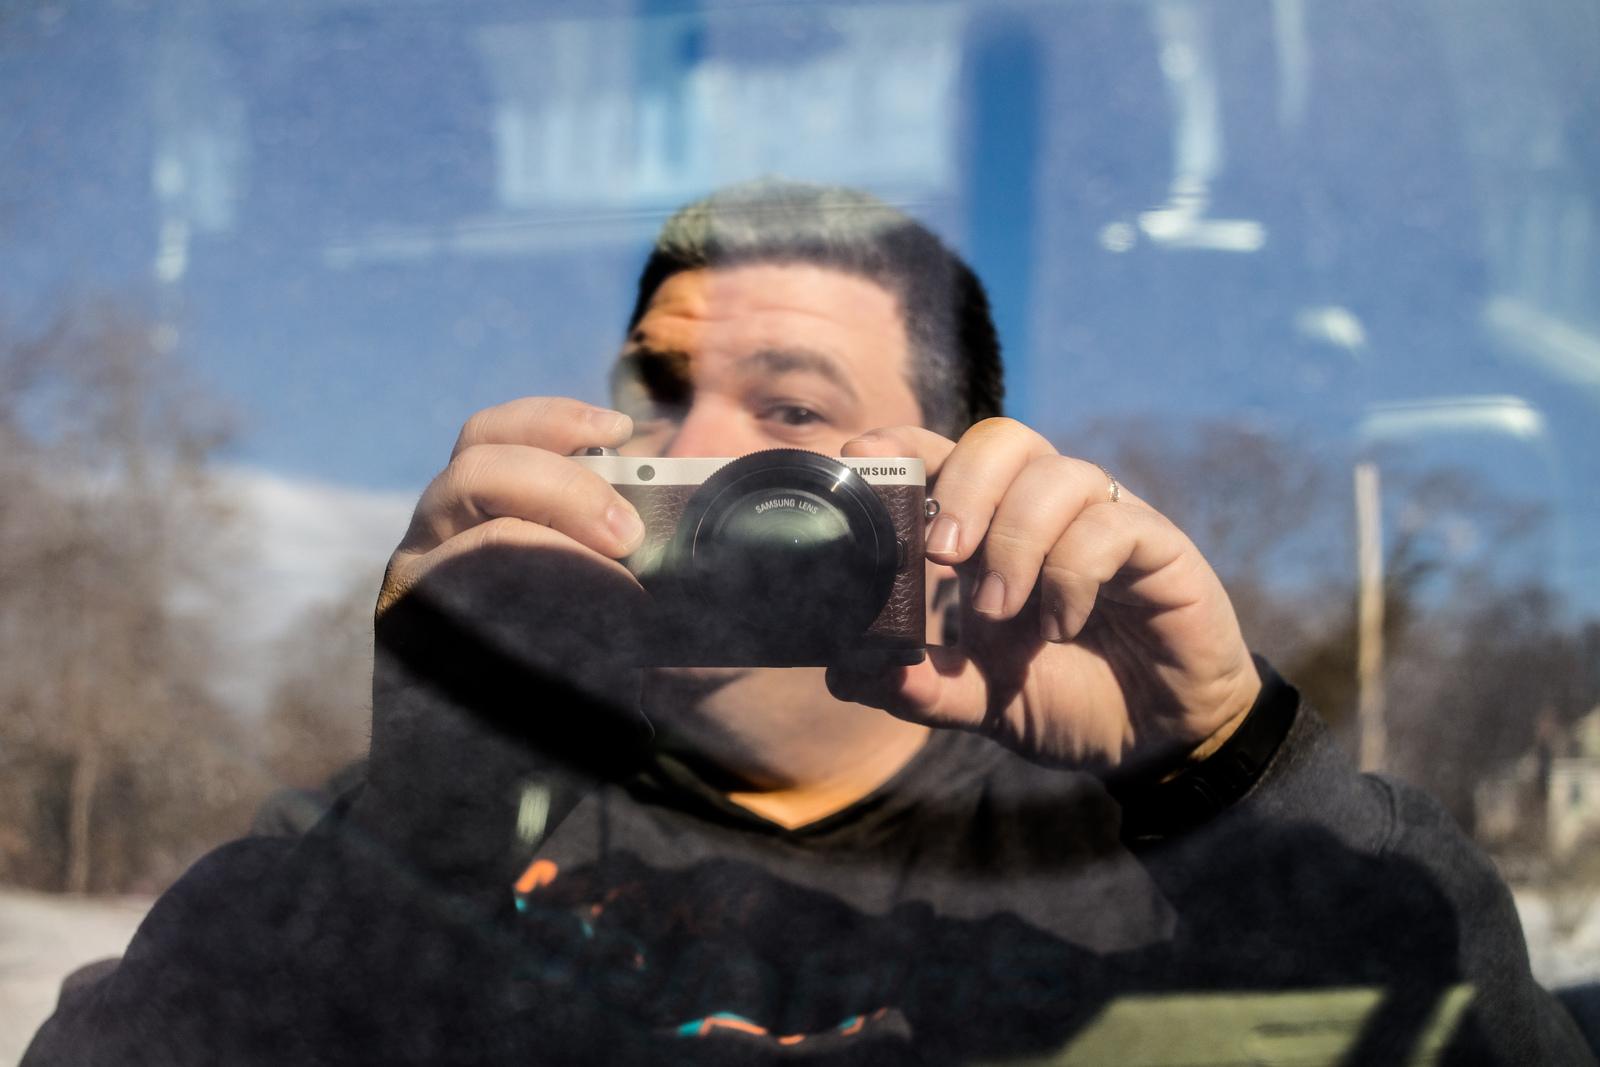 Dirty Window Selfie